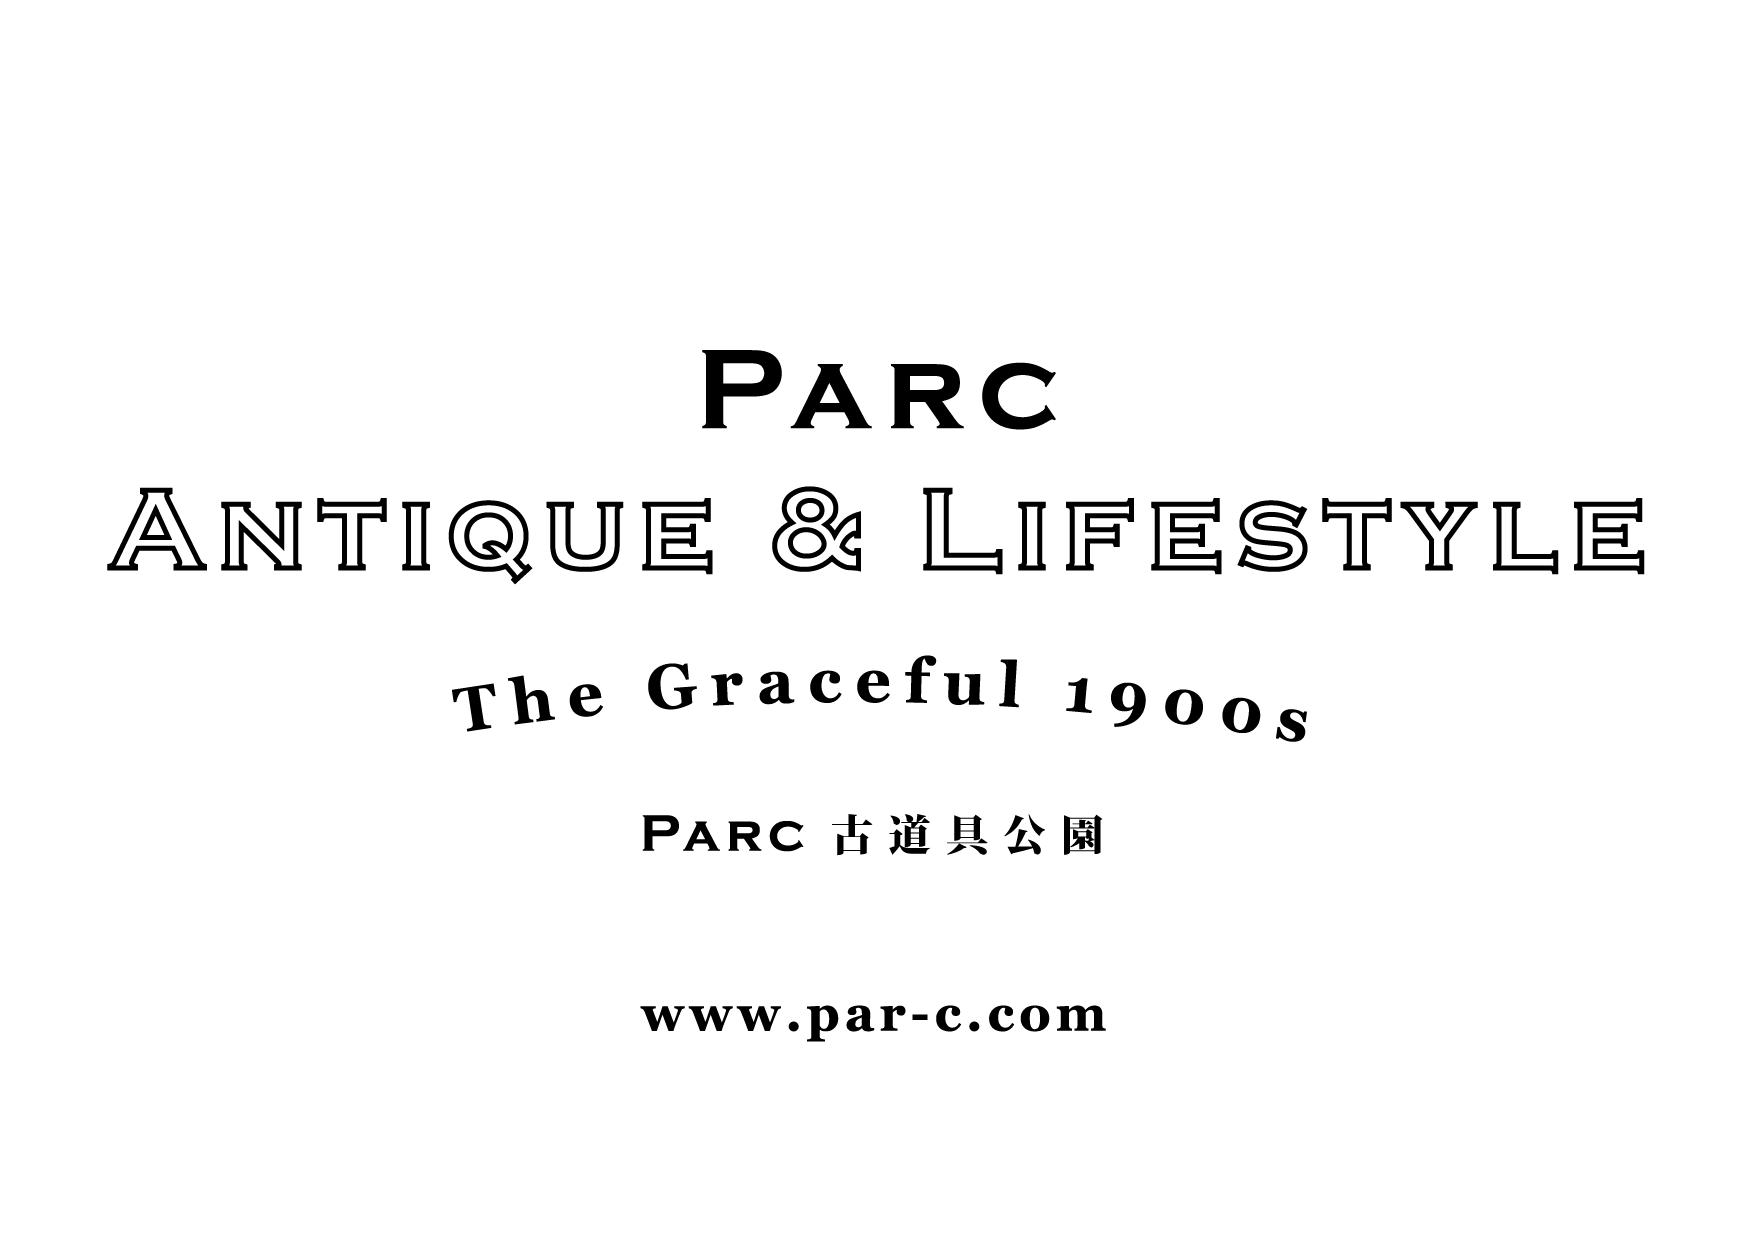 parclogo_2018-01-01.png